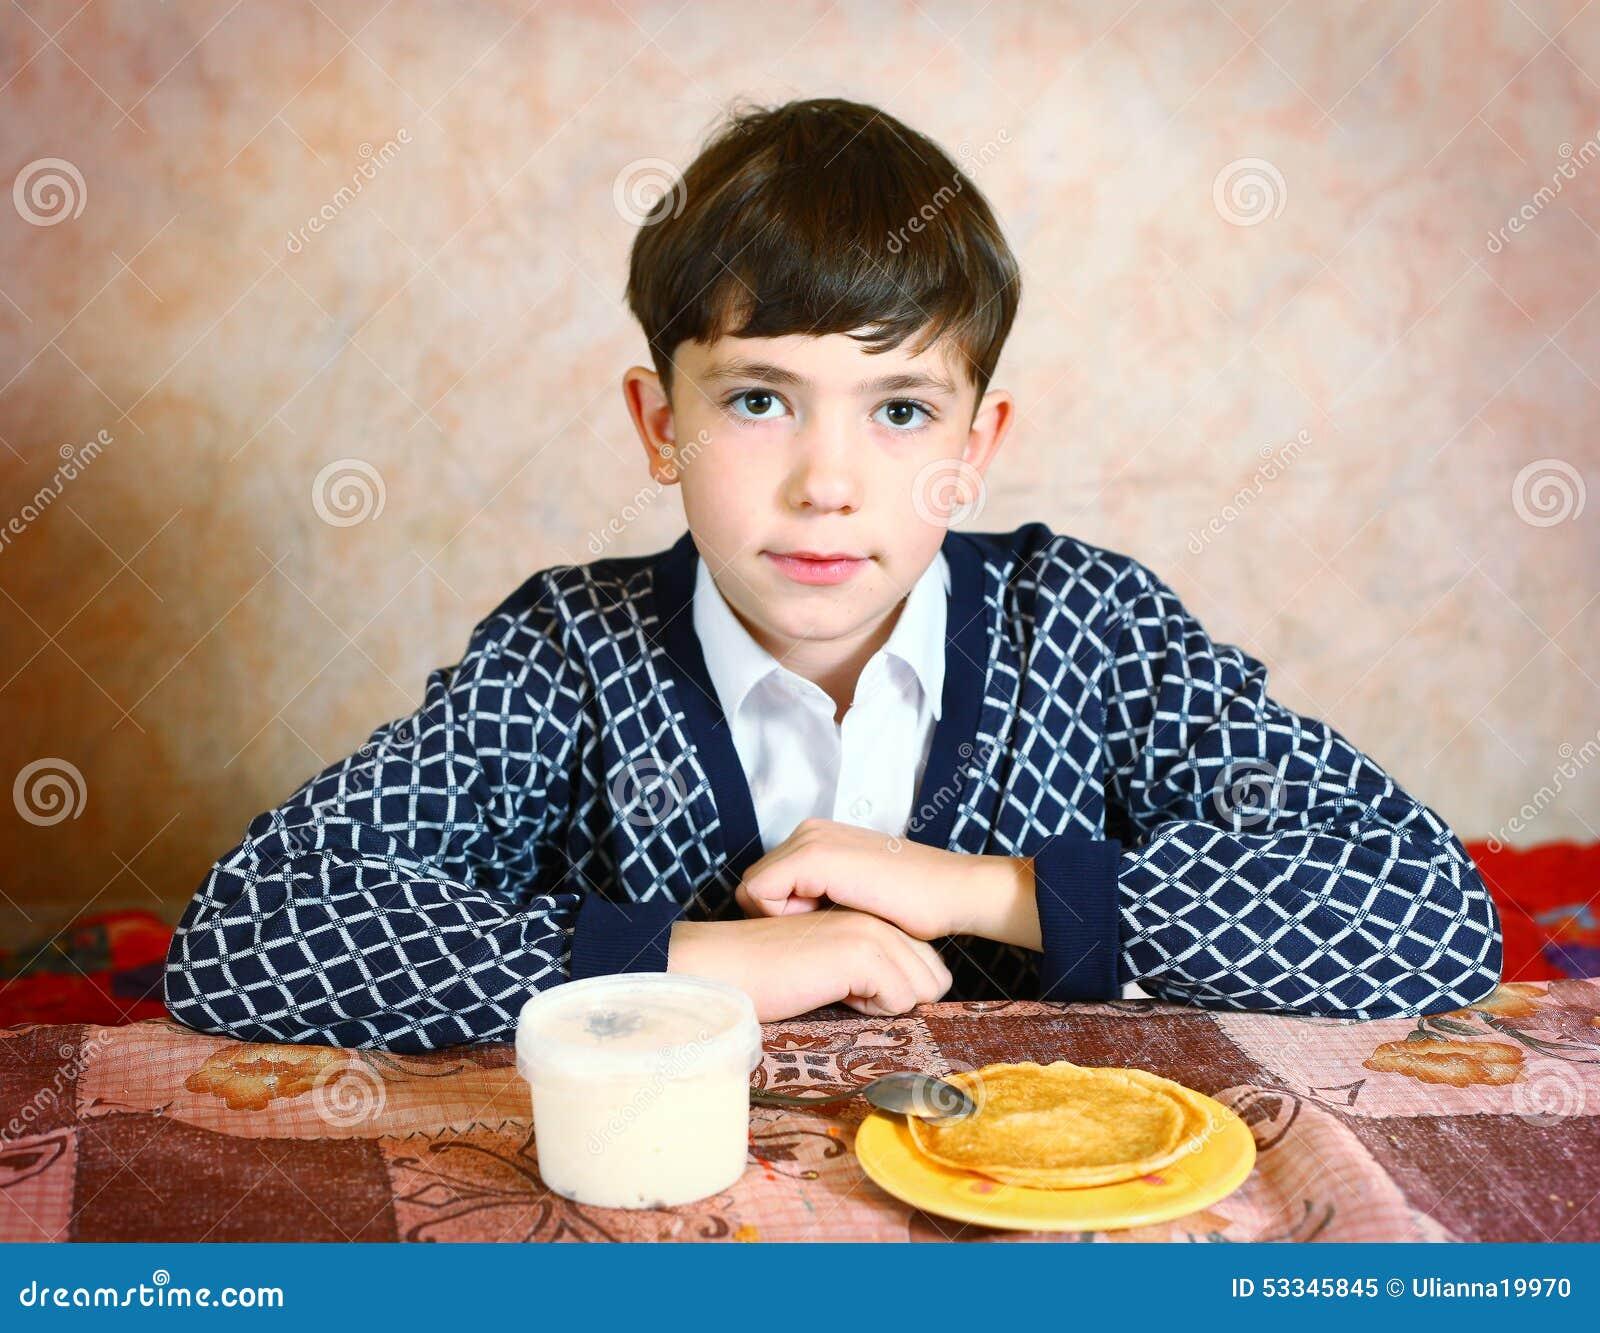 Stock Photo: Handsome preteen boy expressive close black and white ...